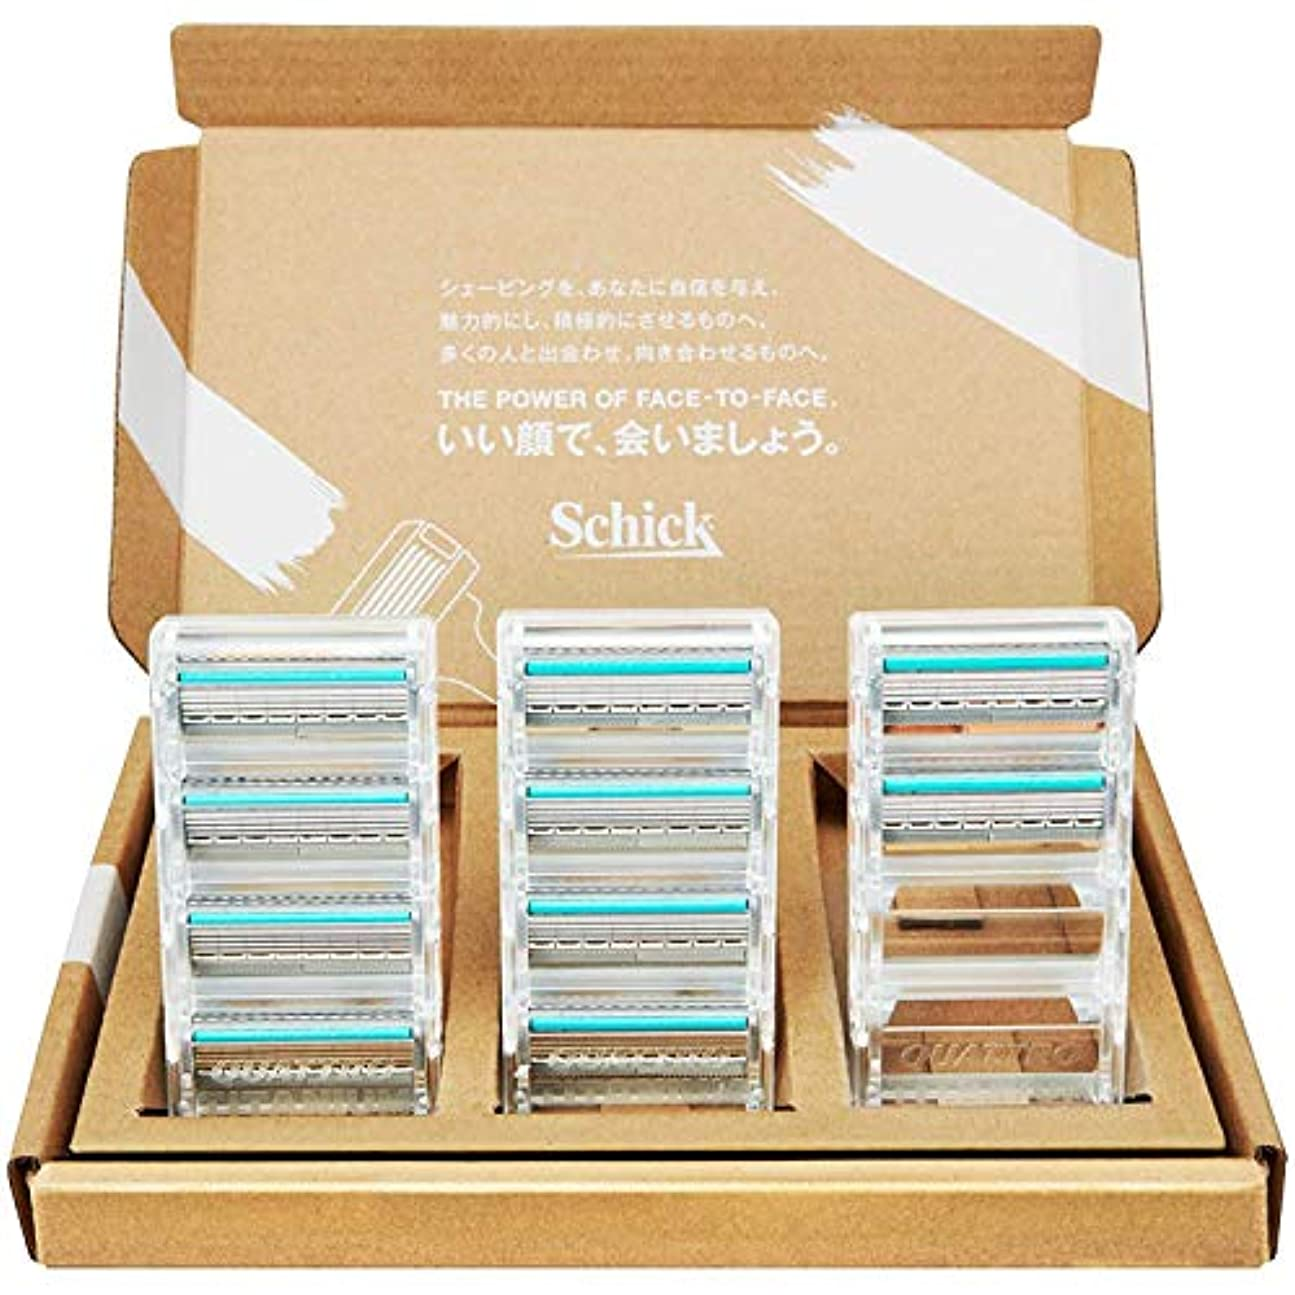 【Amazon.co.jp 限定】シック クアトロ4 チタニウム 替刃 10コ入